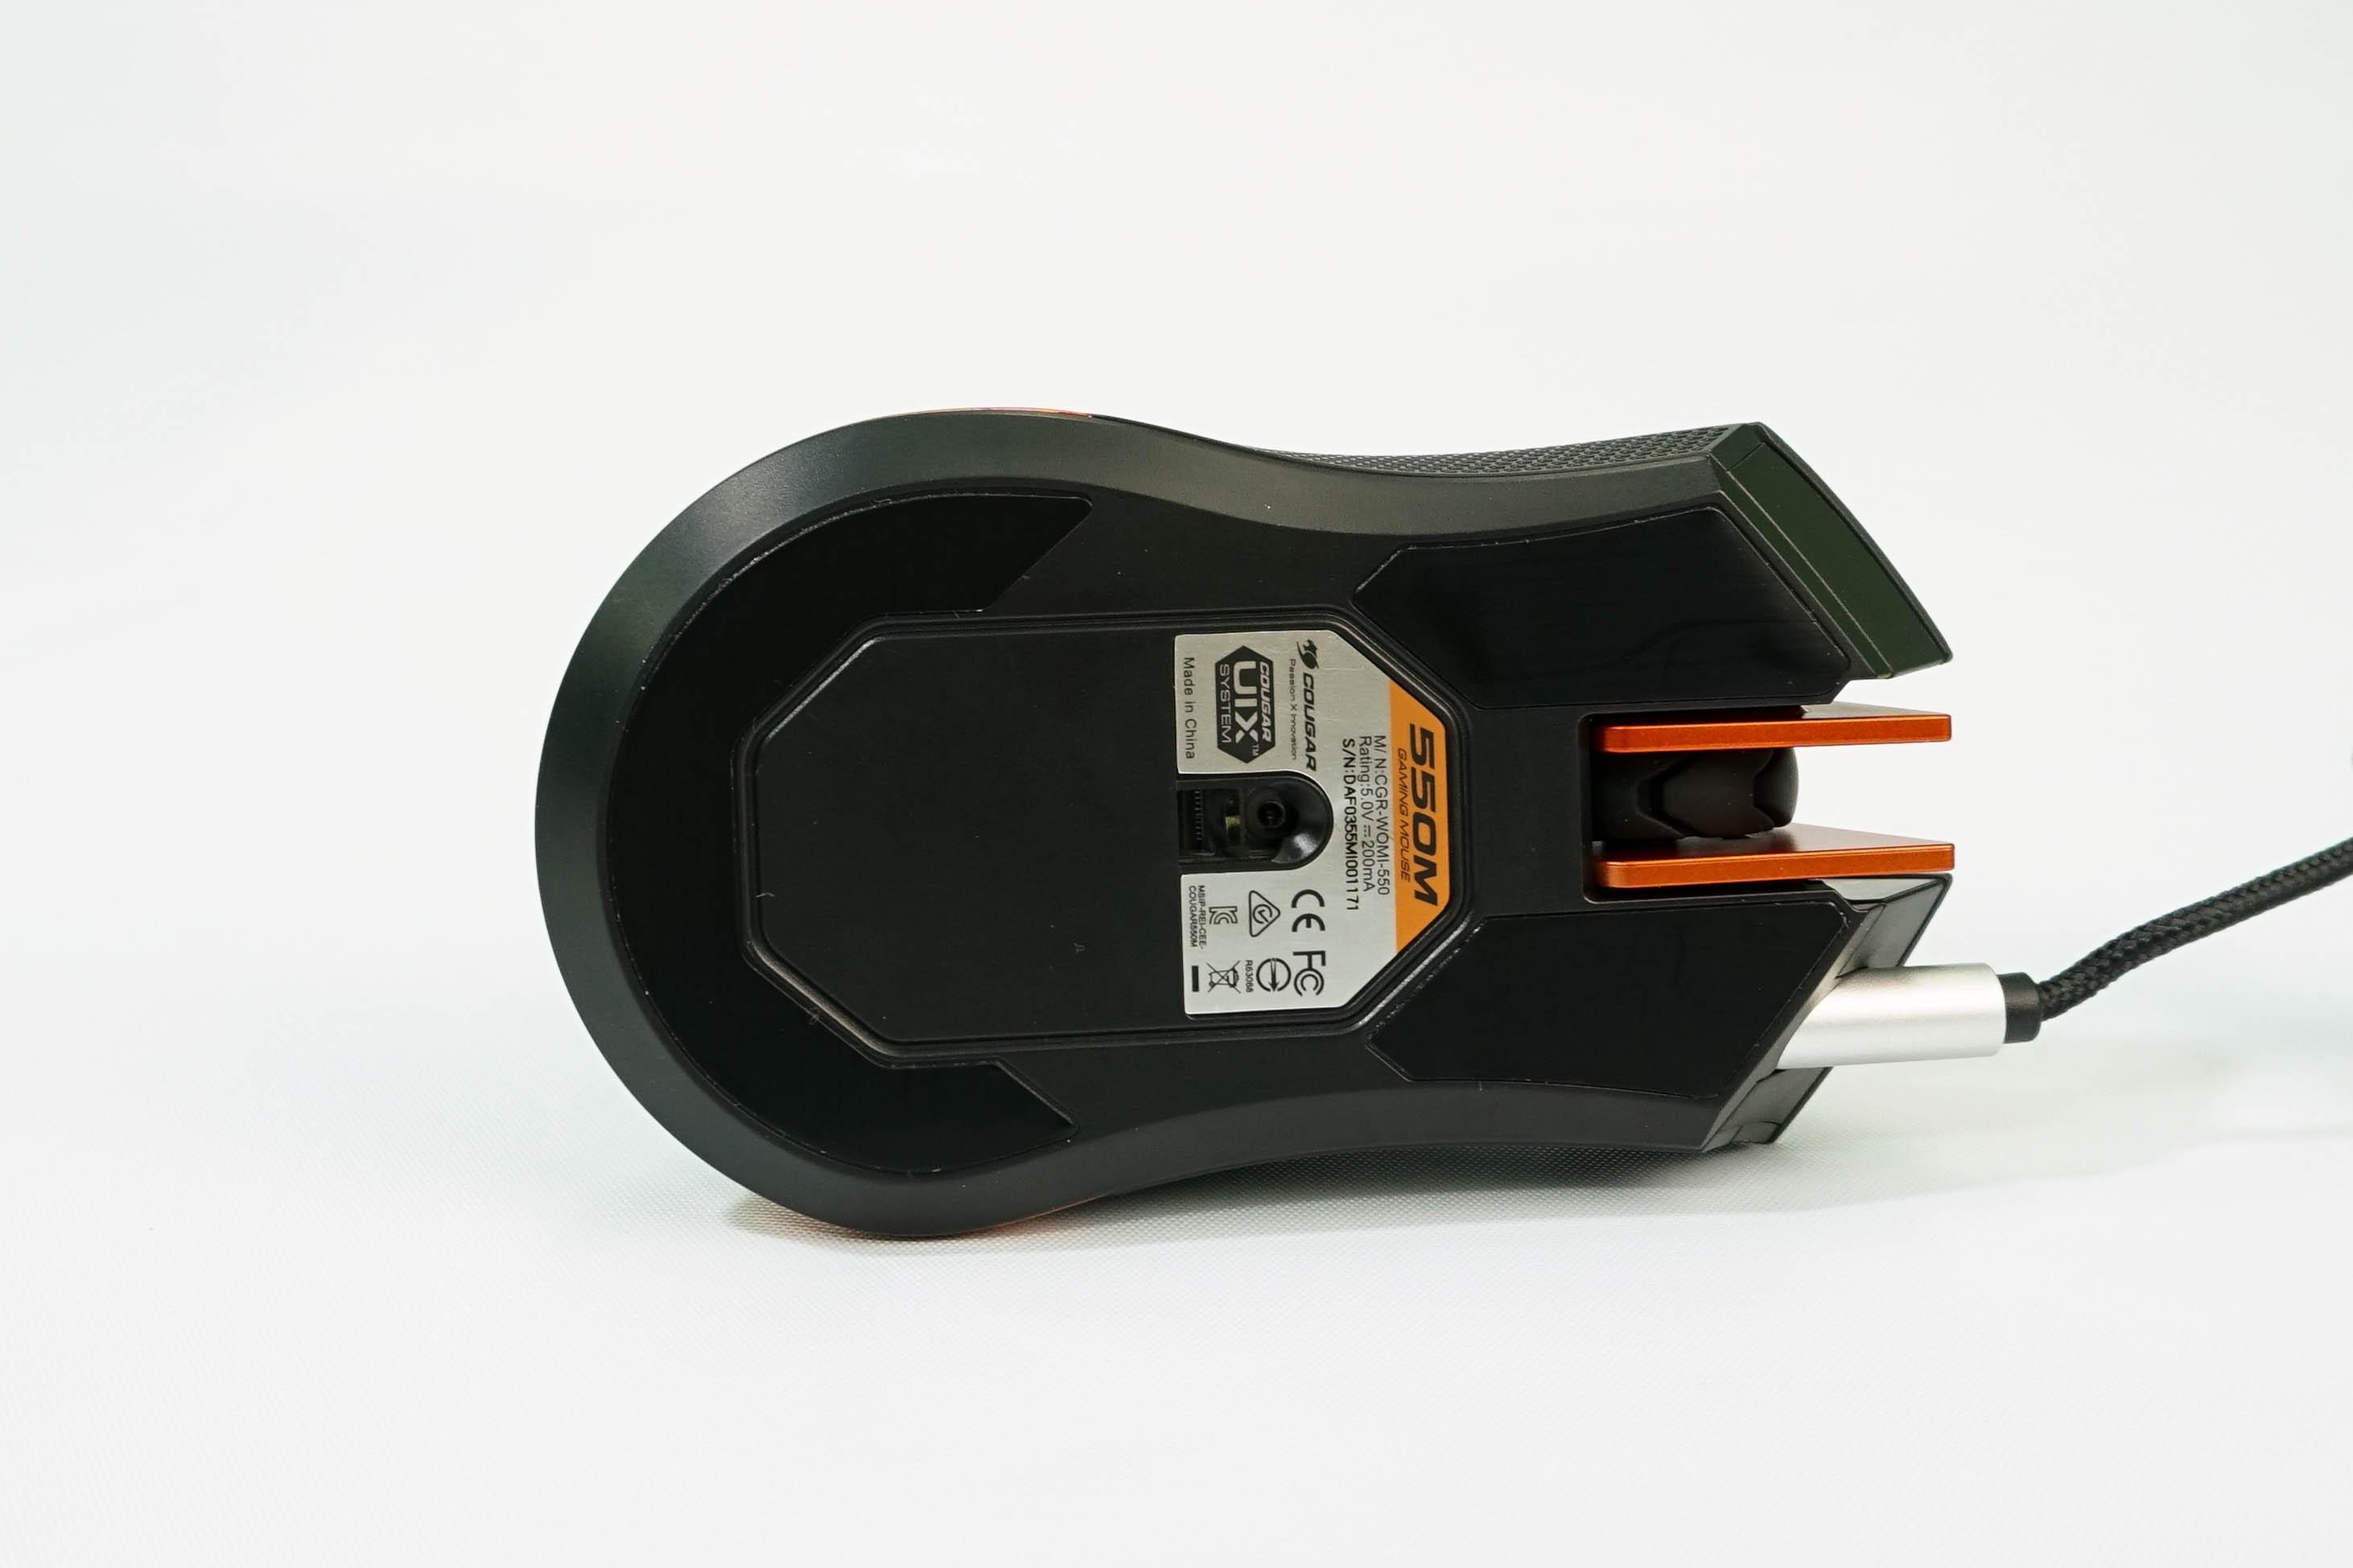 Cougar 550M Iron Grey RGB Led - Ultimate Optical Gaming Mouse